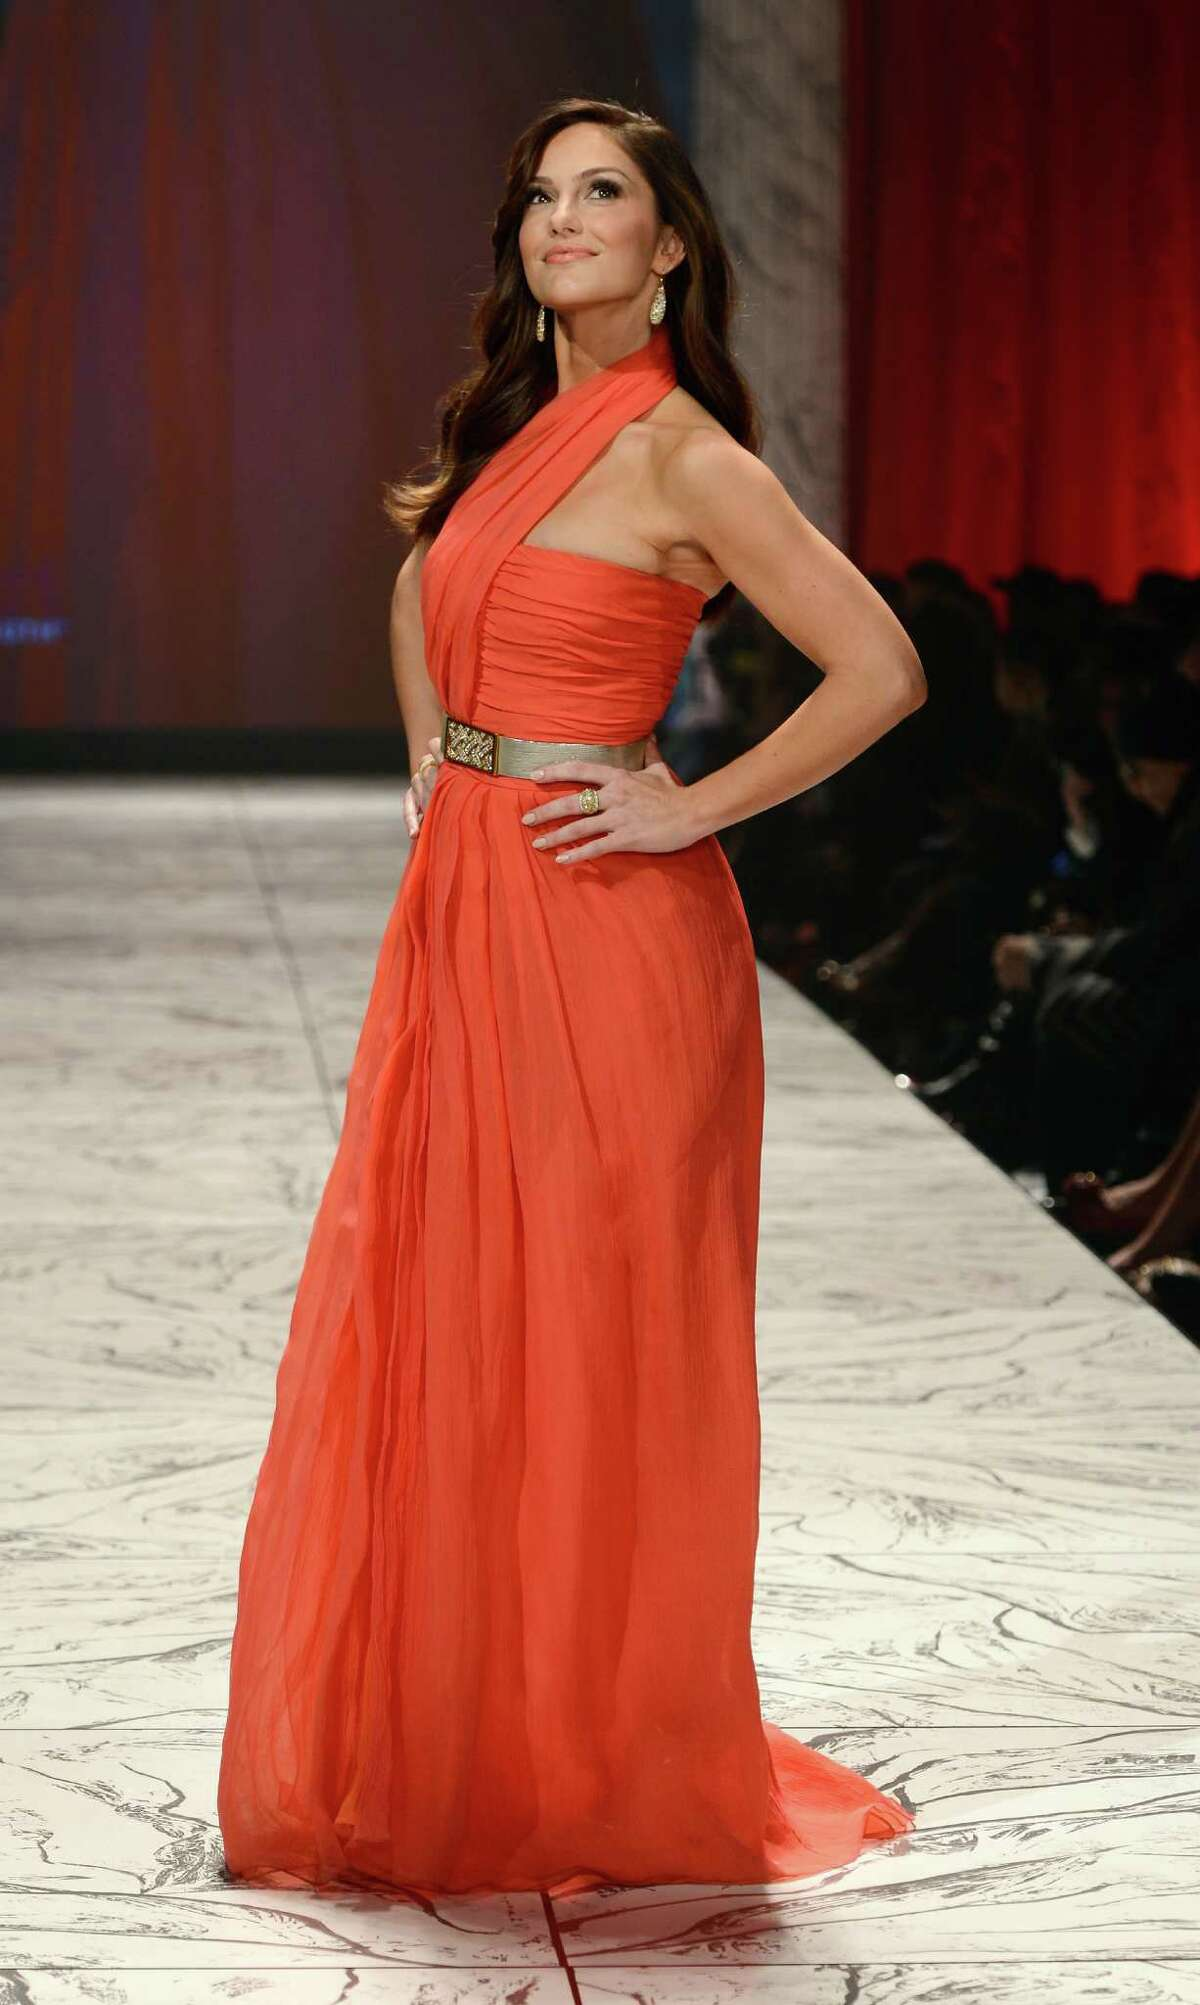 Actress Minka Kelly on the runway at The Heart Truth 2013 Fashion Show.